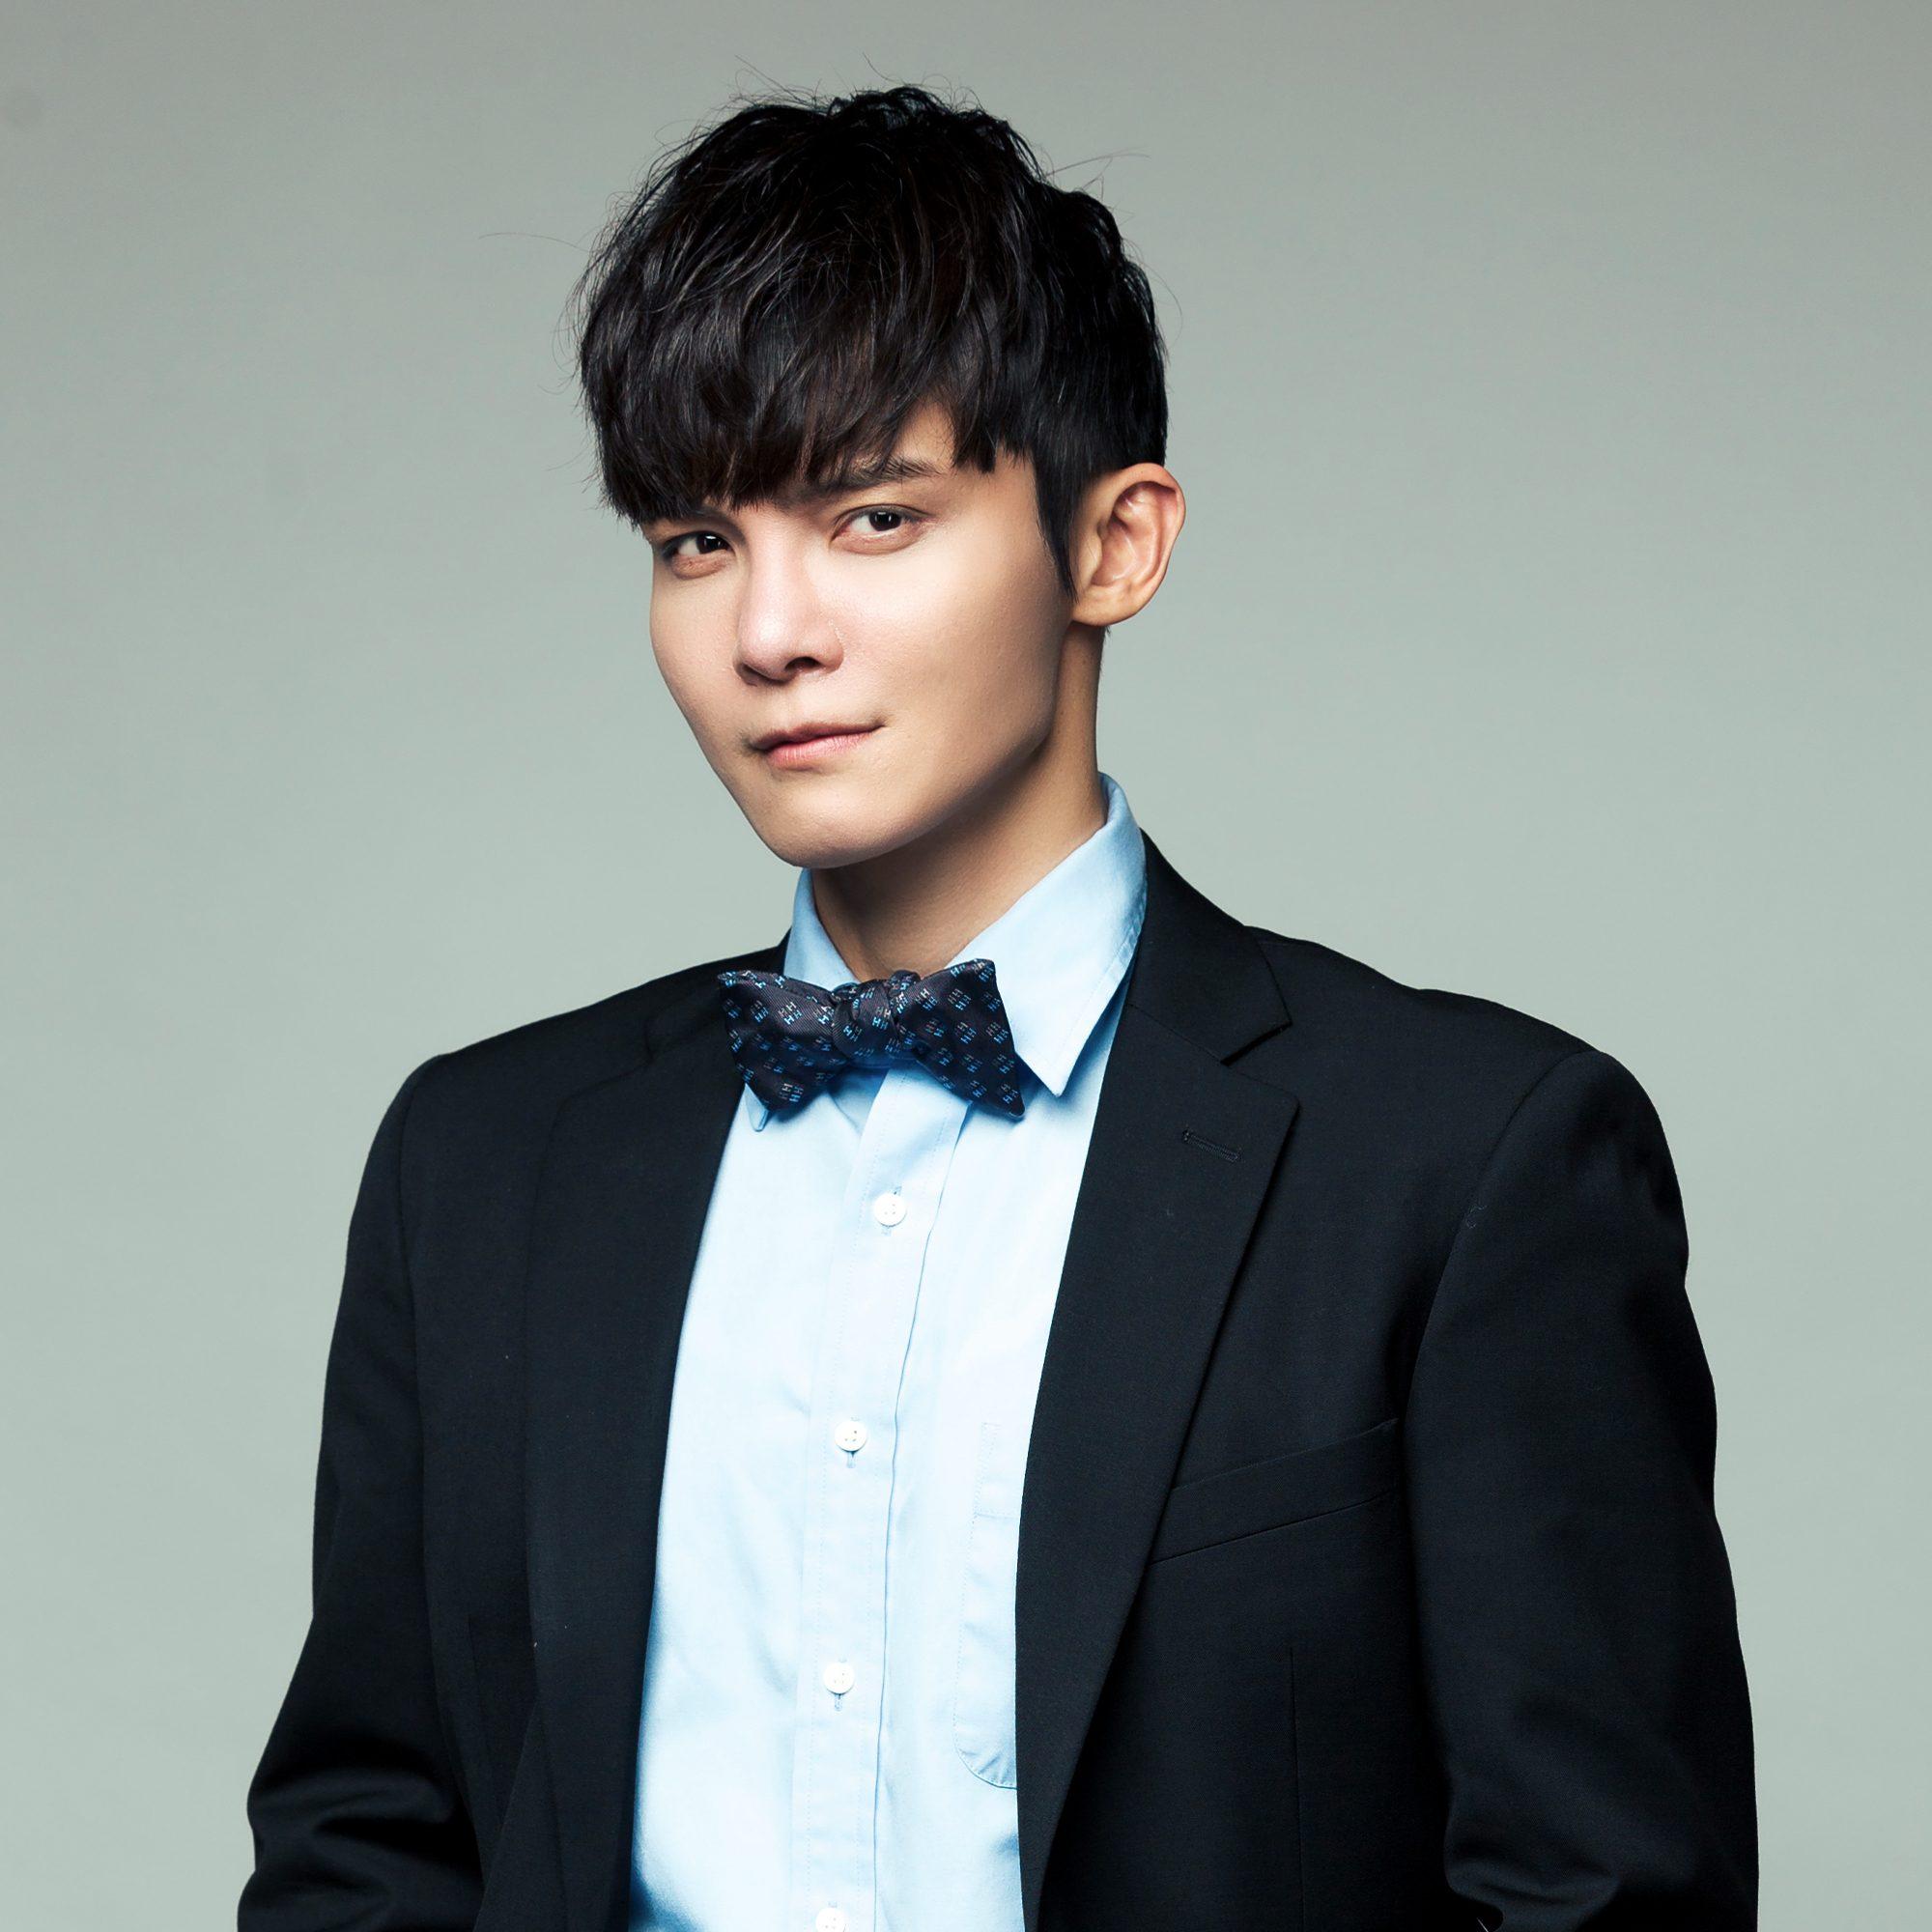 李俊豪醫師